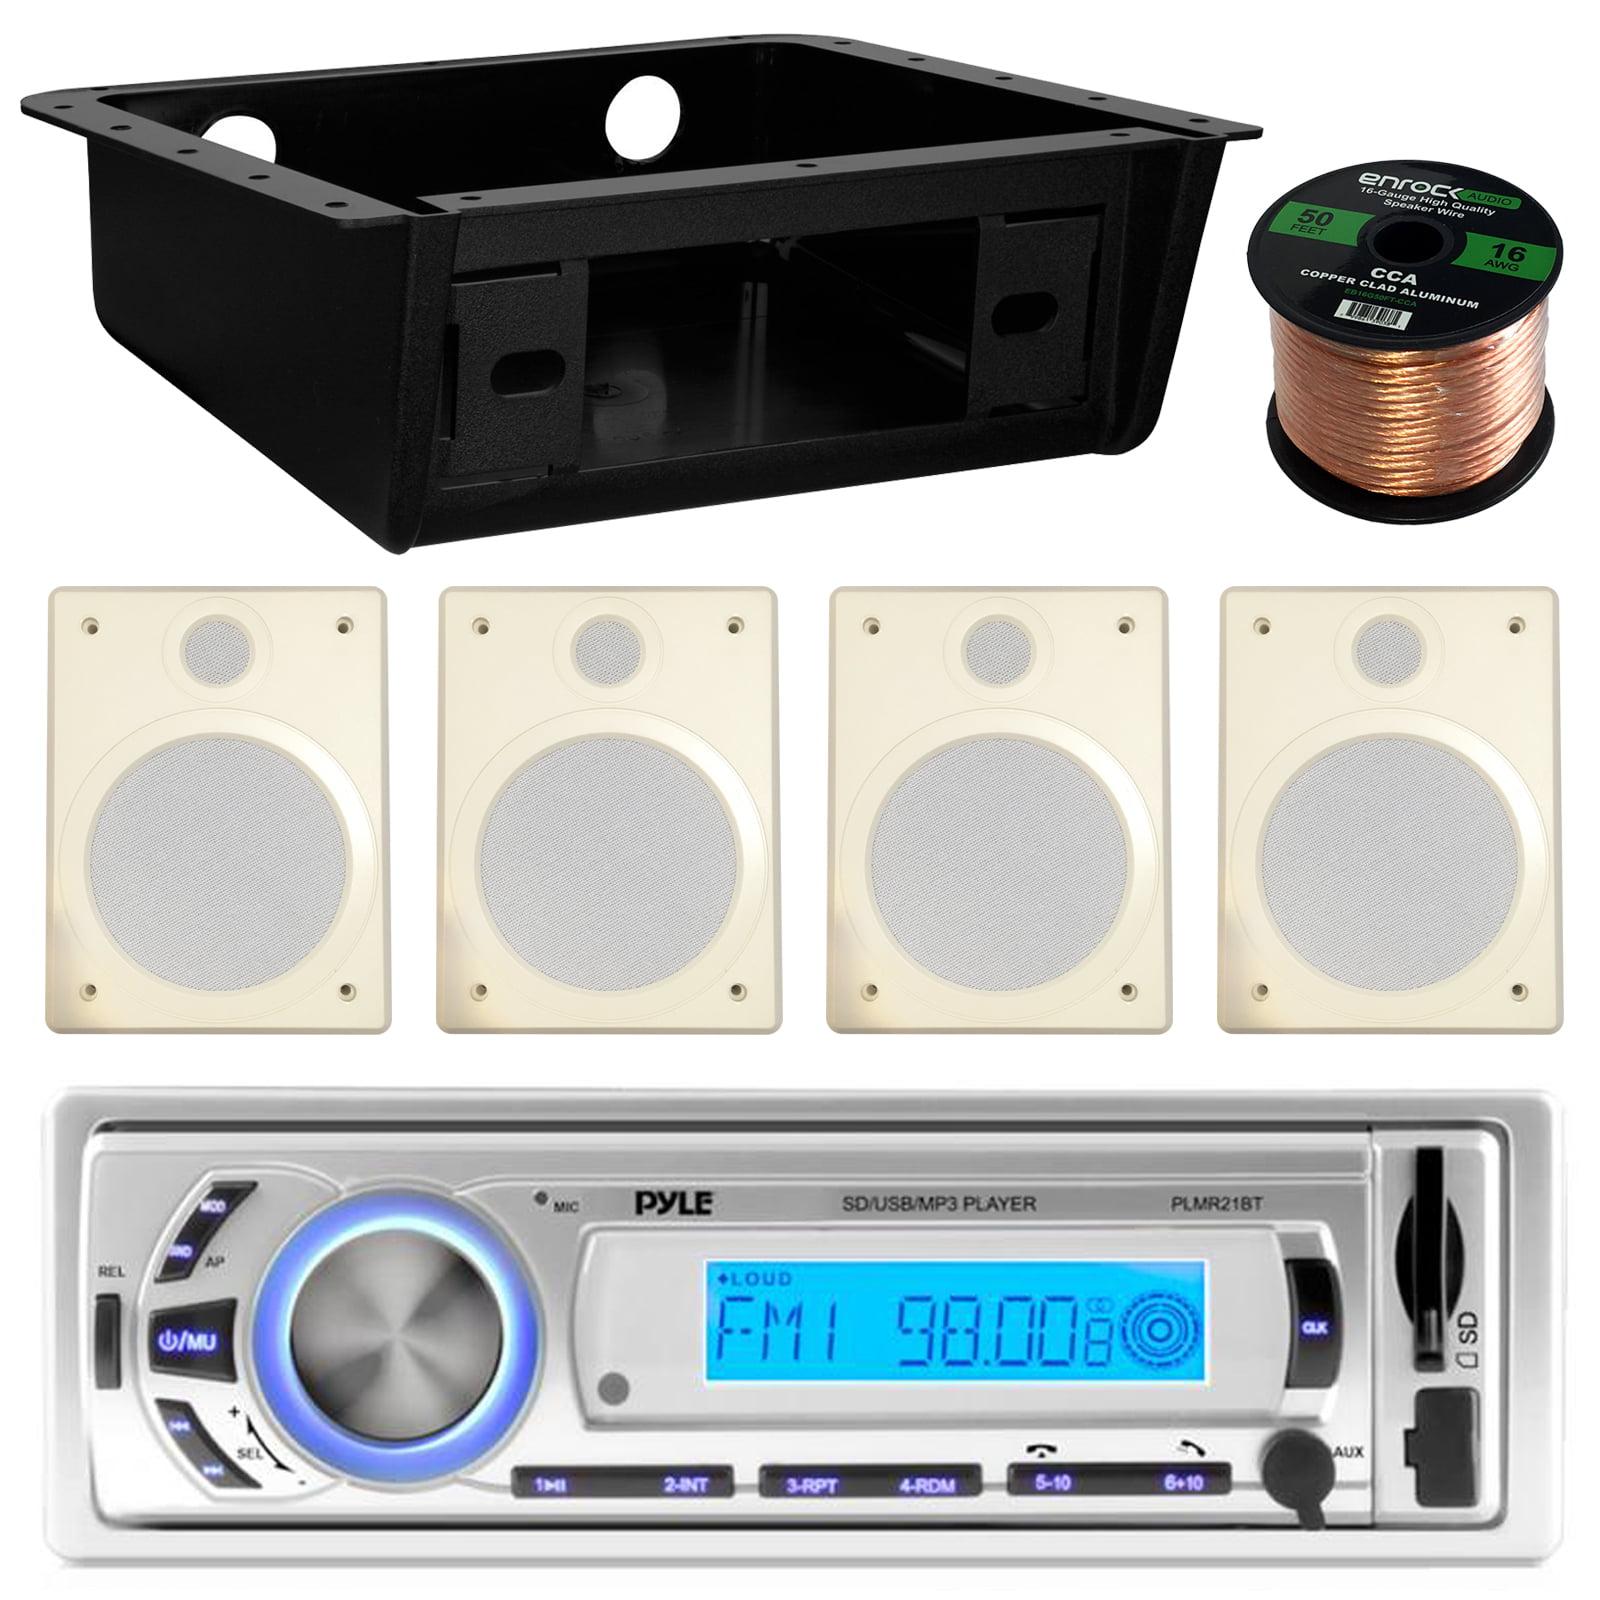 Pyle PLMR21BT USB/SD/MP3 Bluetooth Stereo Receiver Bundle...